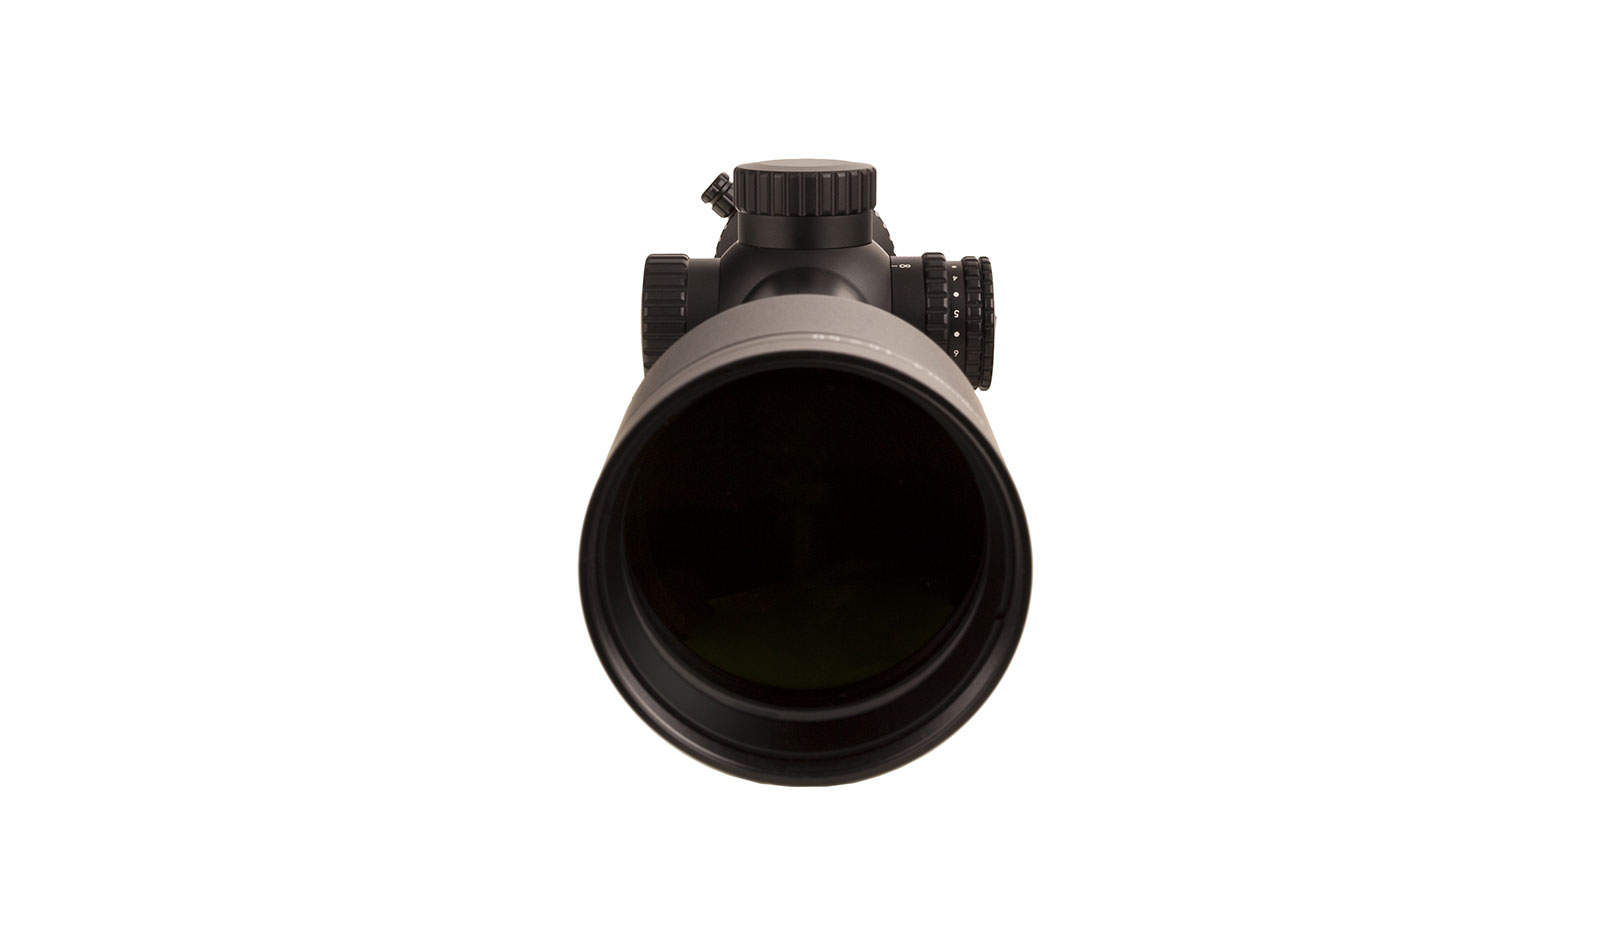 CRHX1650-C-2900005 angle 8